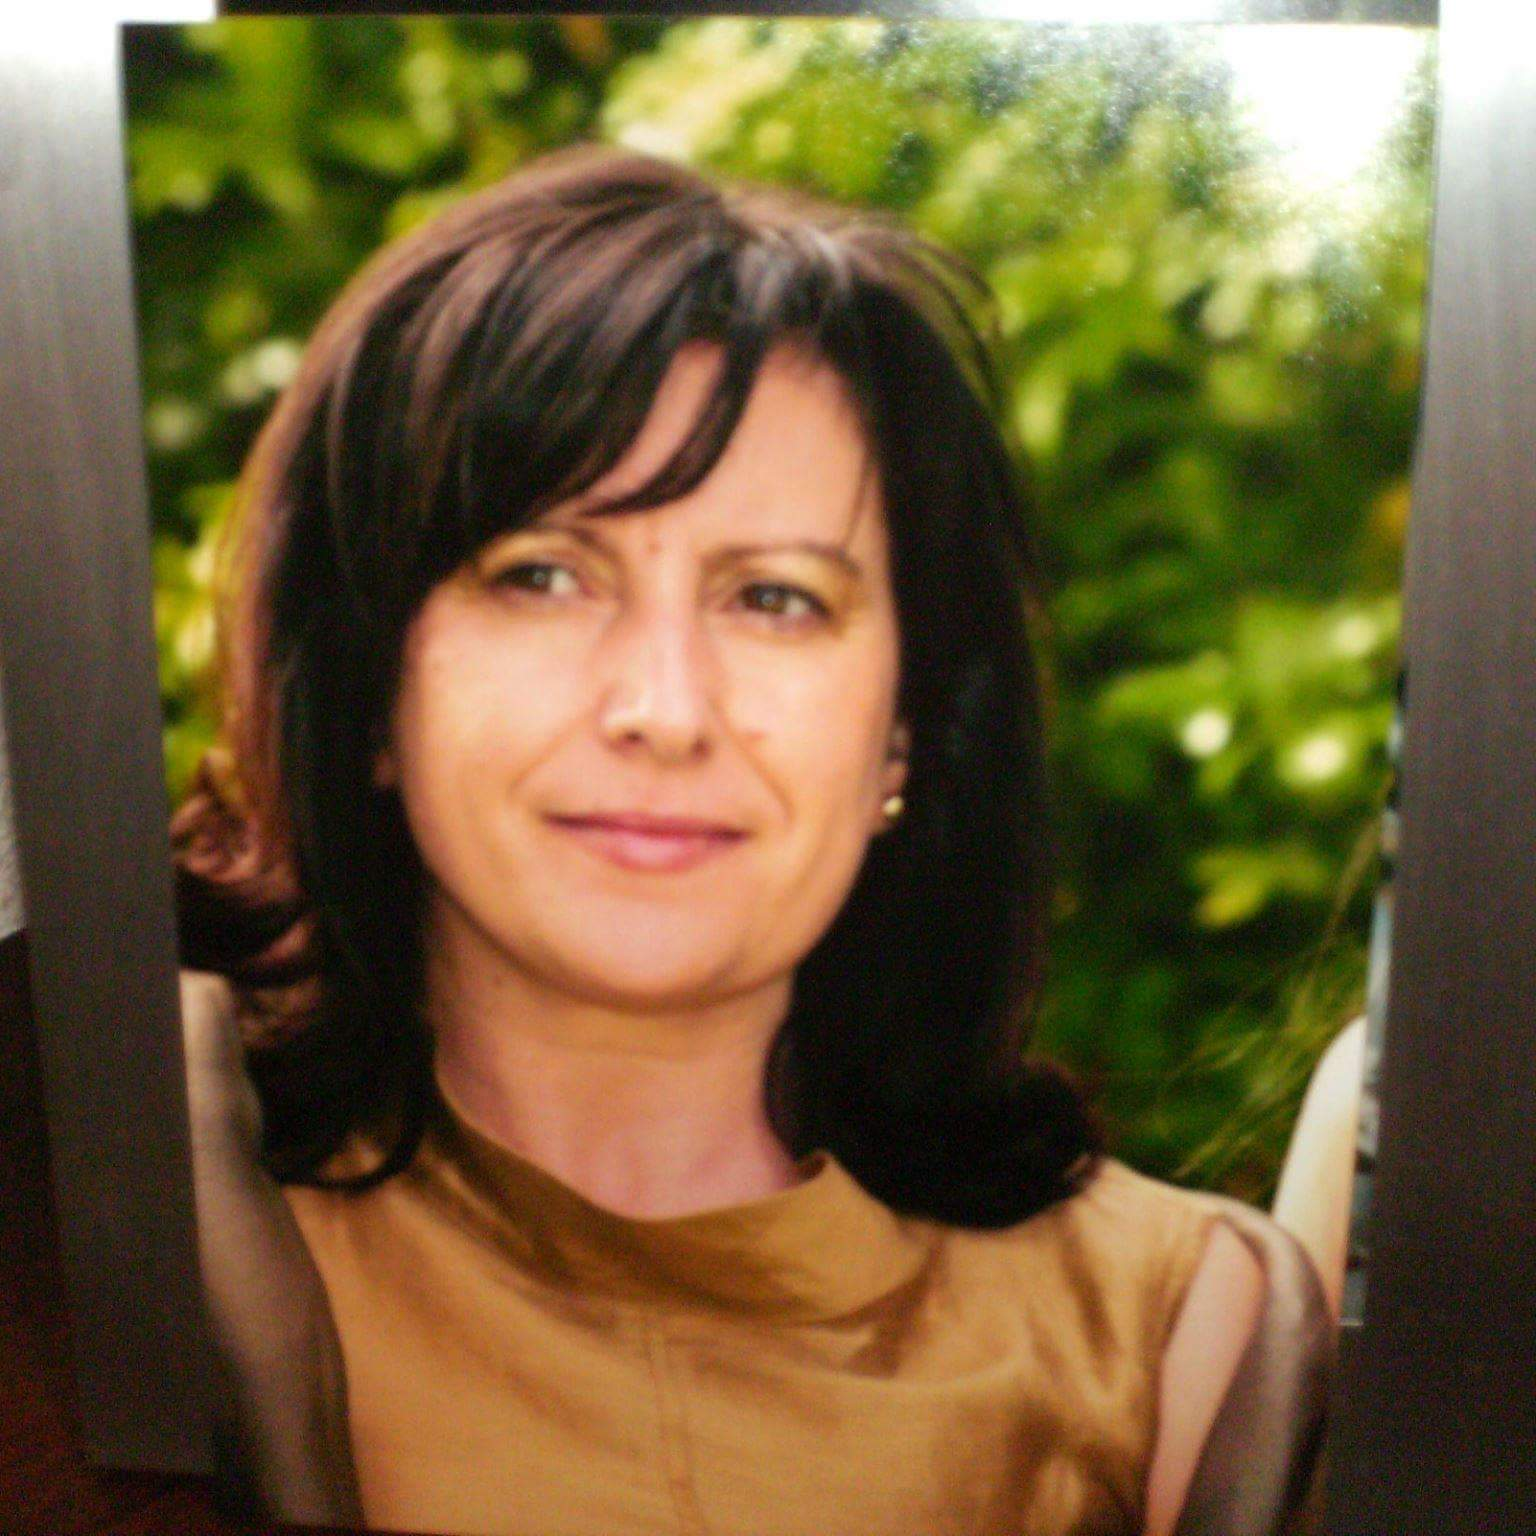 Manuela Machado